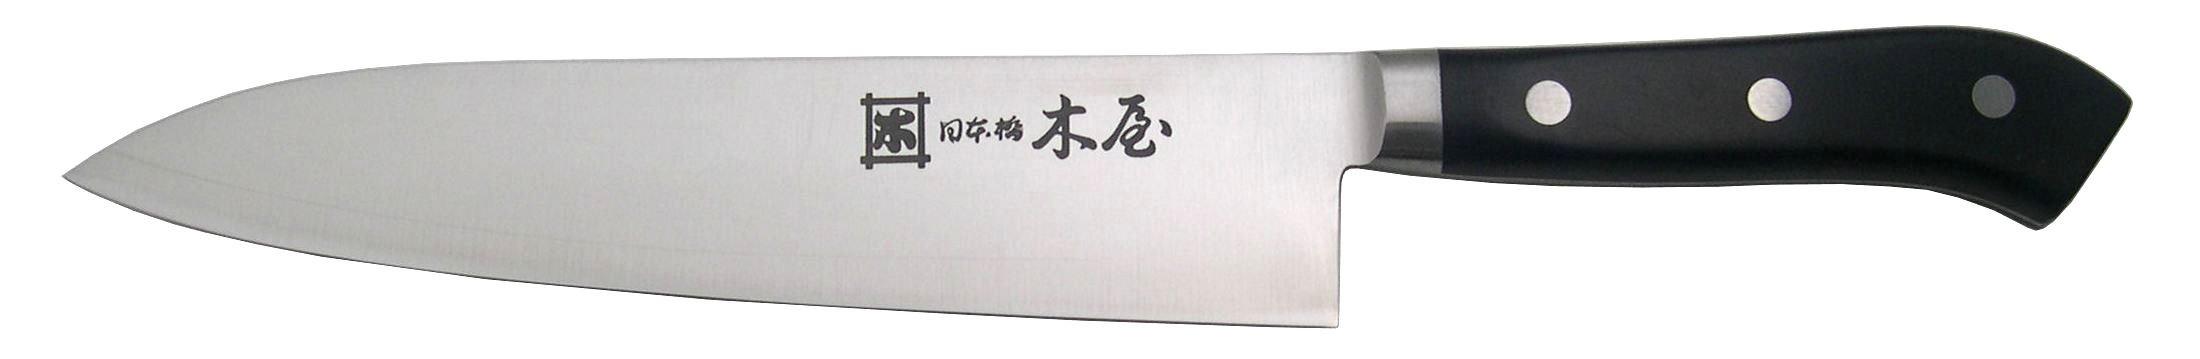 Kiya No. 160 Gyuto Knife 200mm / Asian Chefs Knife 7.8 inches - Direct Import from Kiya Nihonbashi Tokyo, Japan - Tokyo's Most Famous Knife Shop